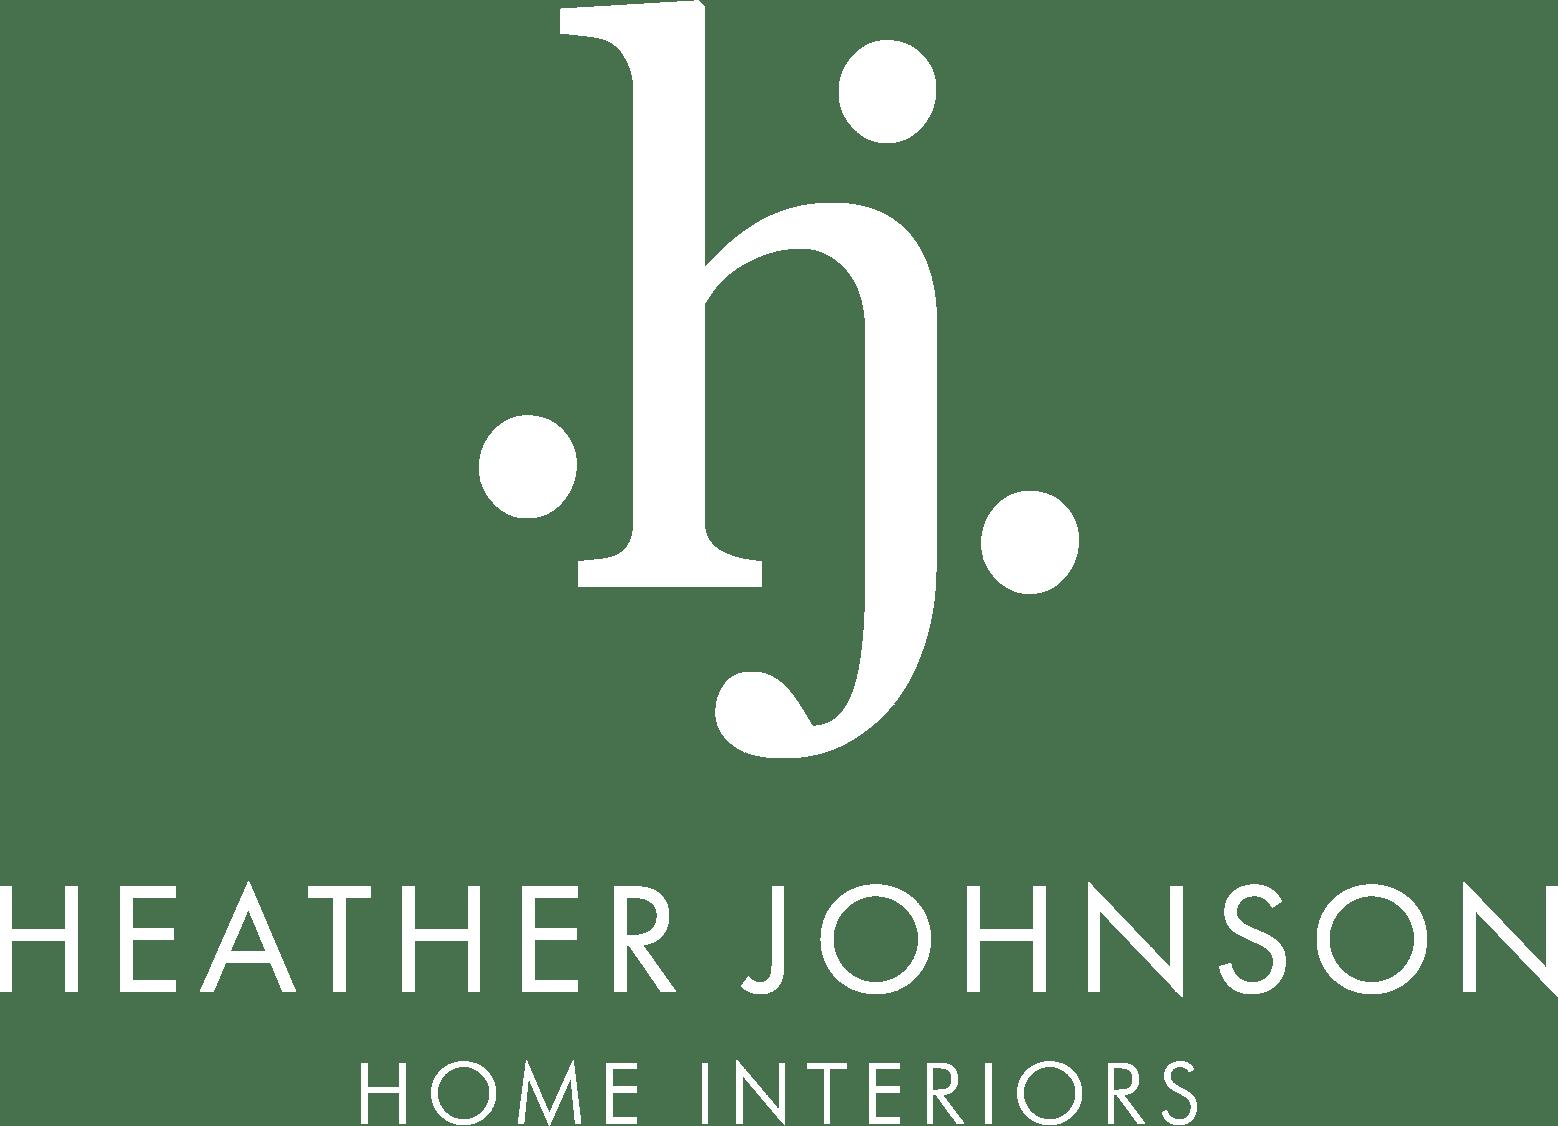 Heather Johnson Home Interiors Logo